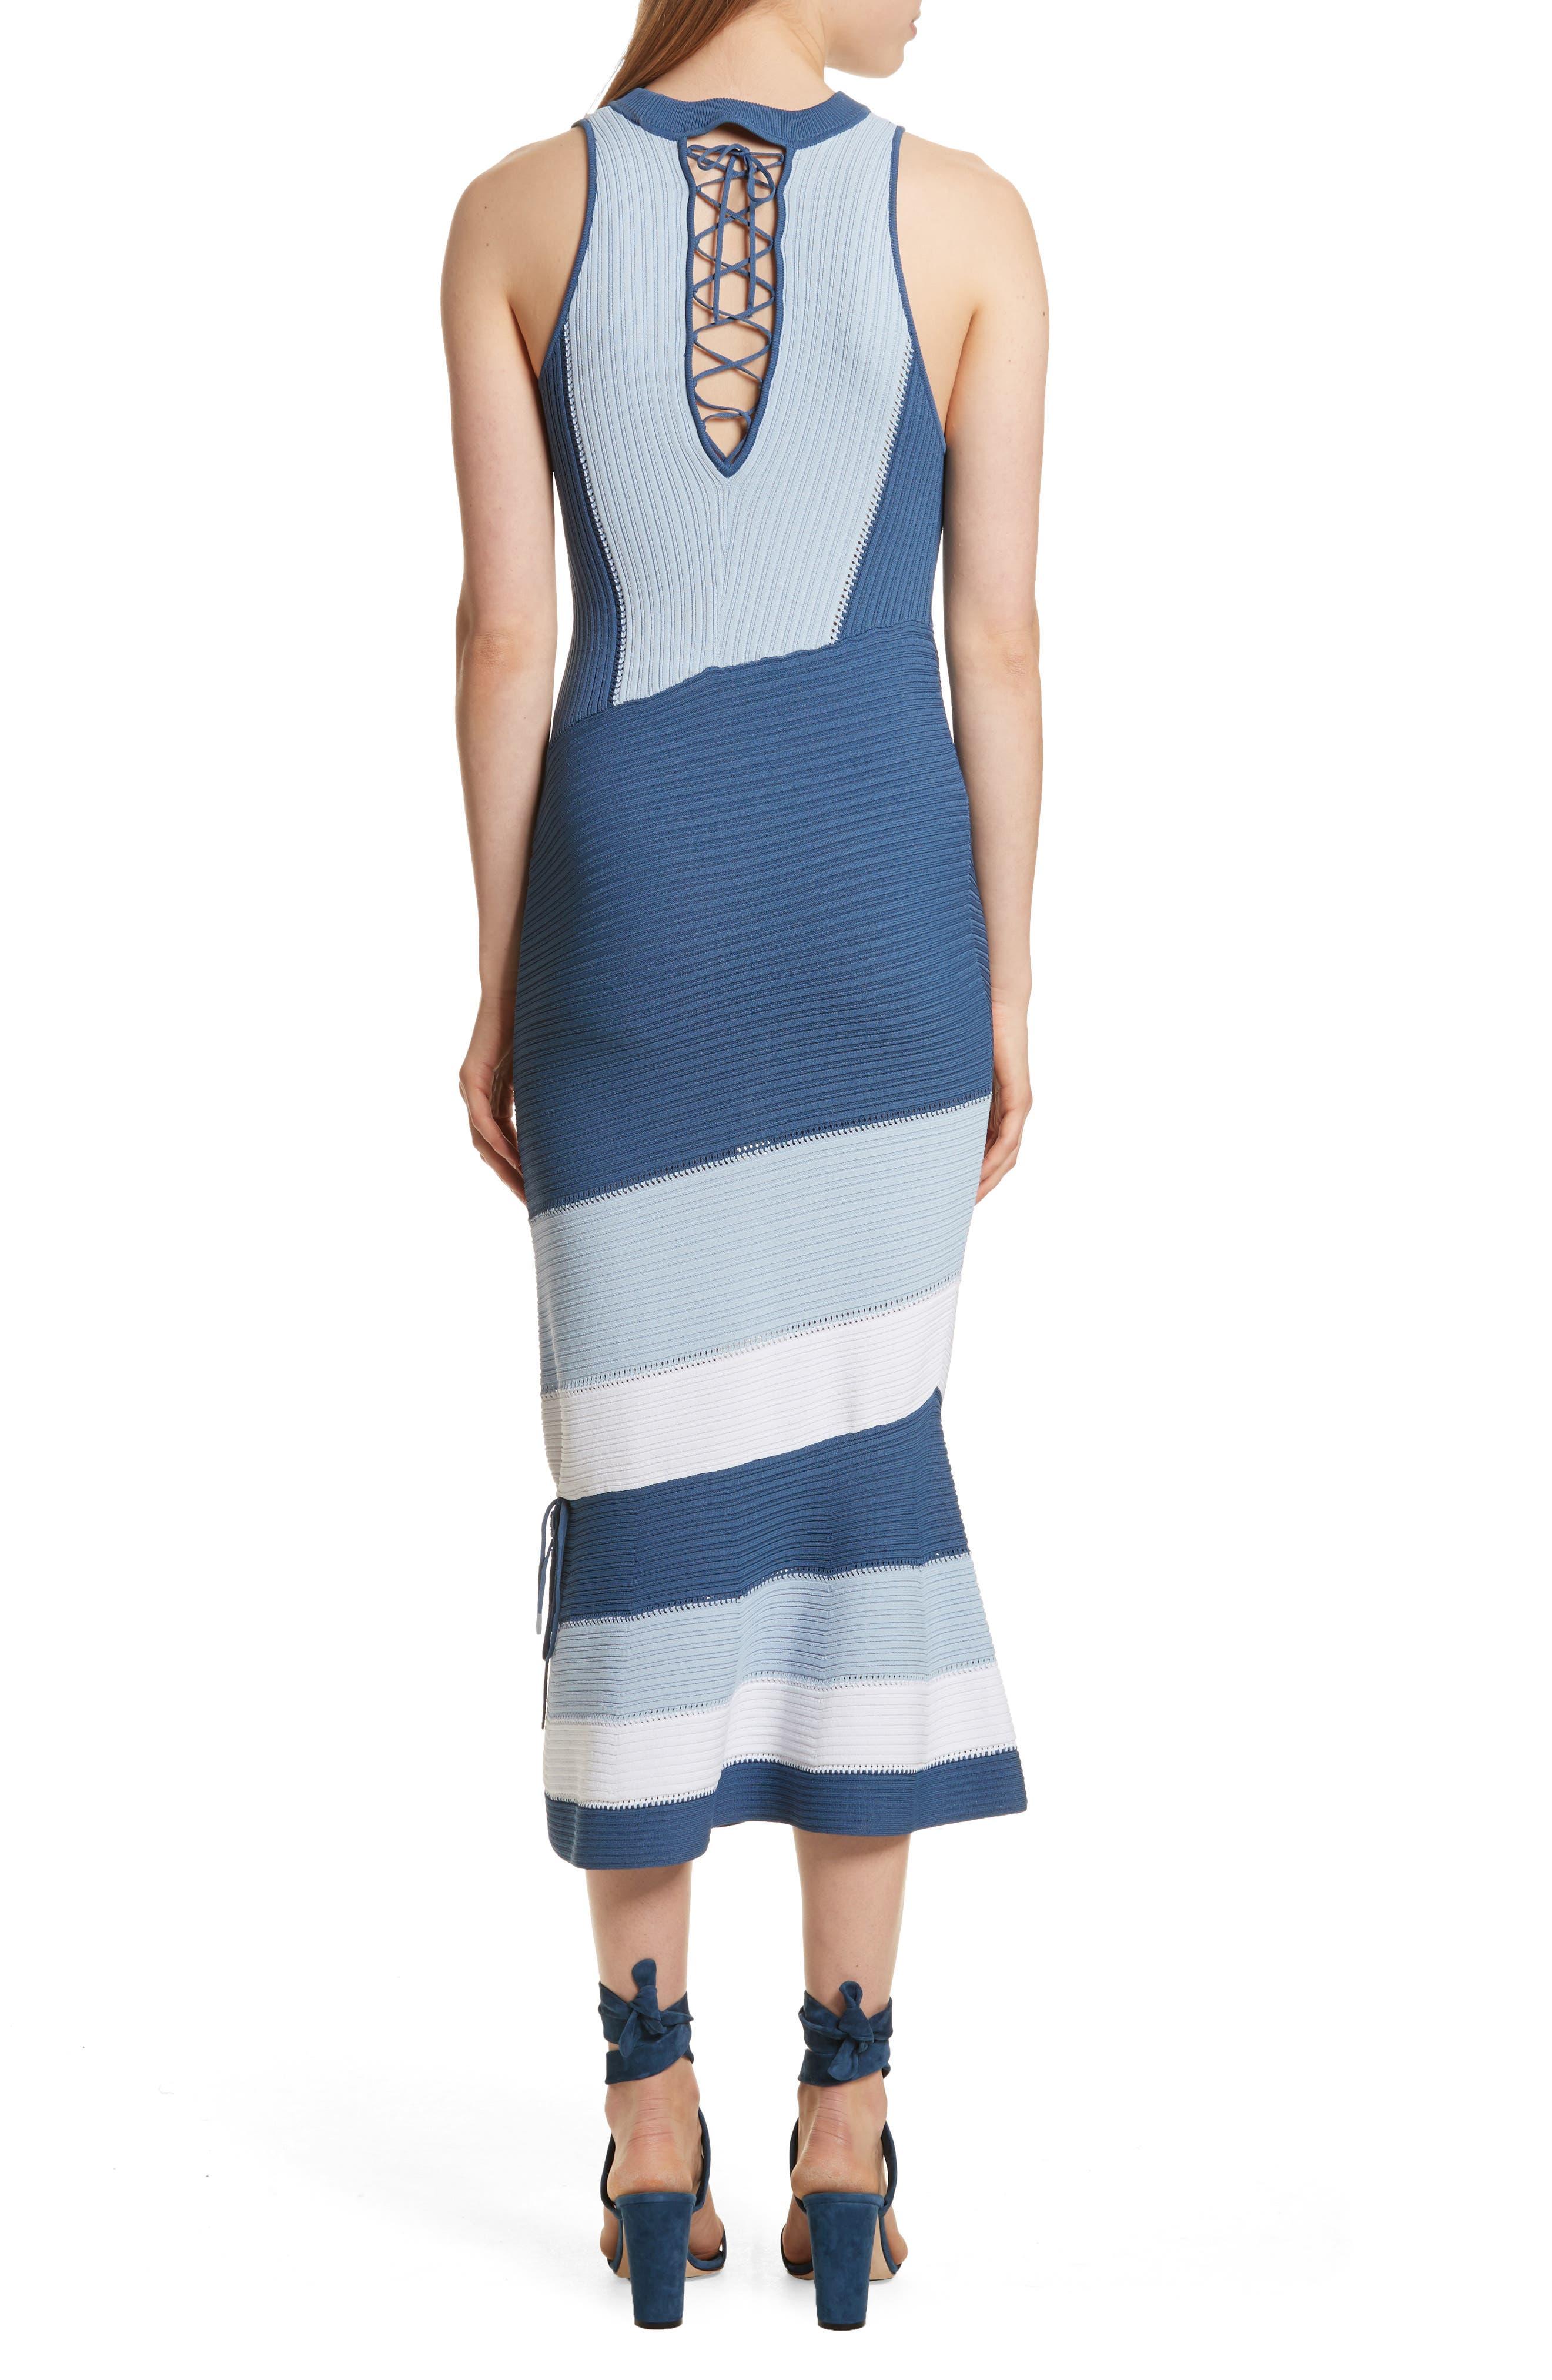 Linked Asymmetrical Dress,                             Alternate thumbnail 2, color,                             478